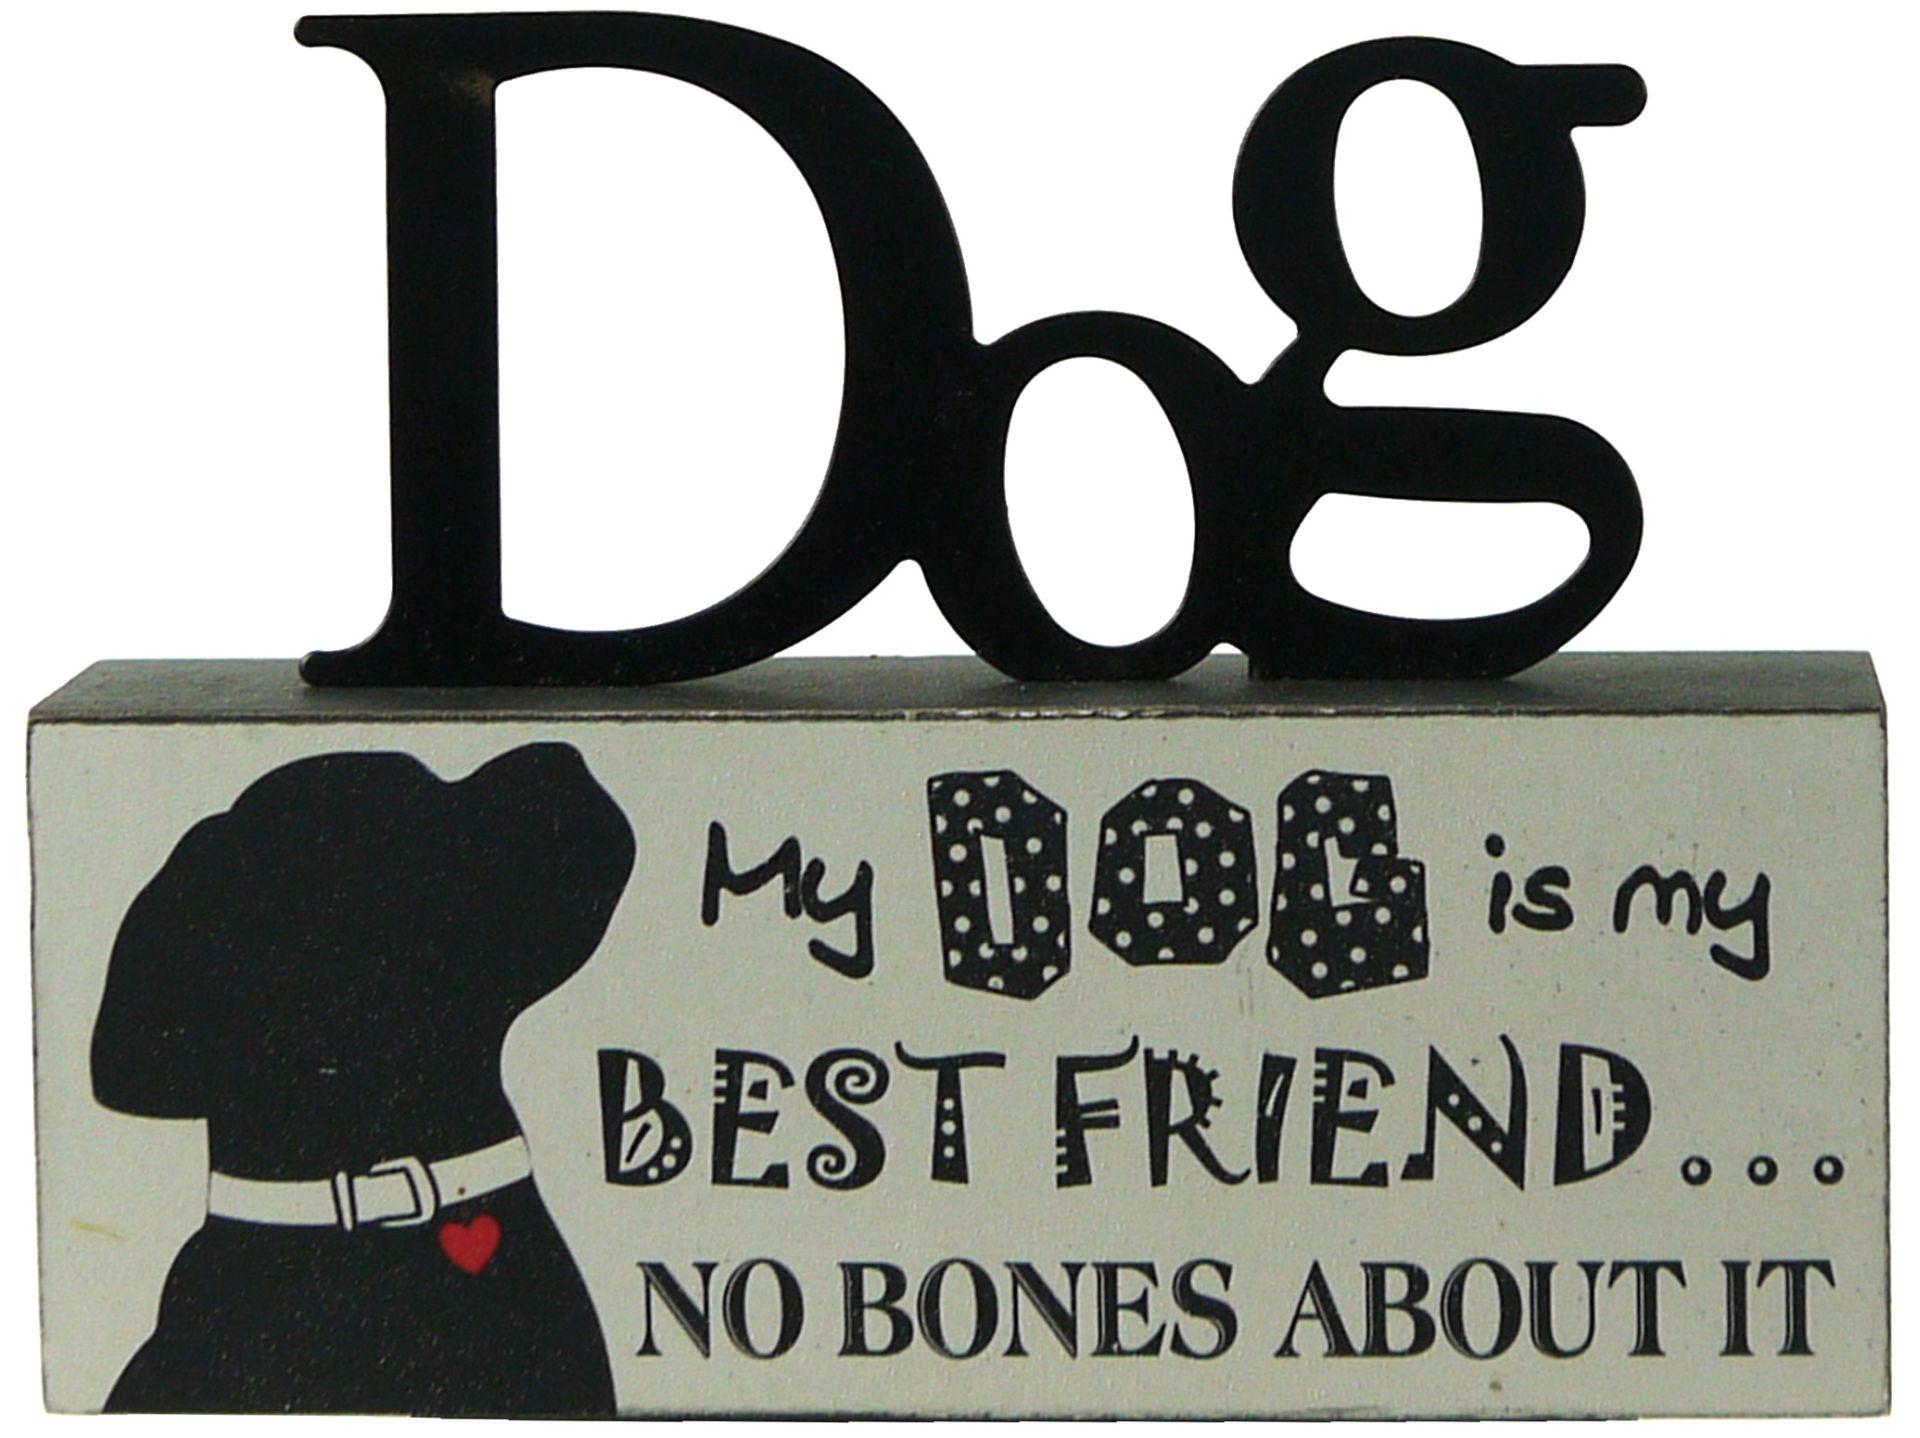 Dog Backgrounds Best Friend Lovely Dog Images: I Love Dogs Wallpaper